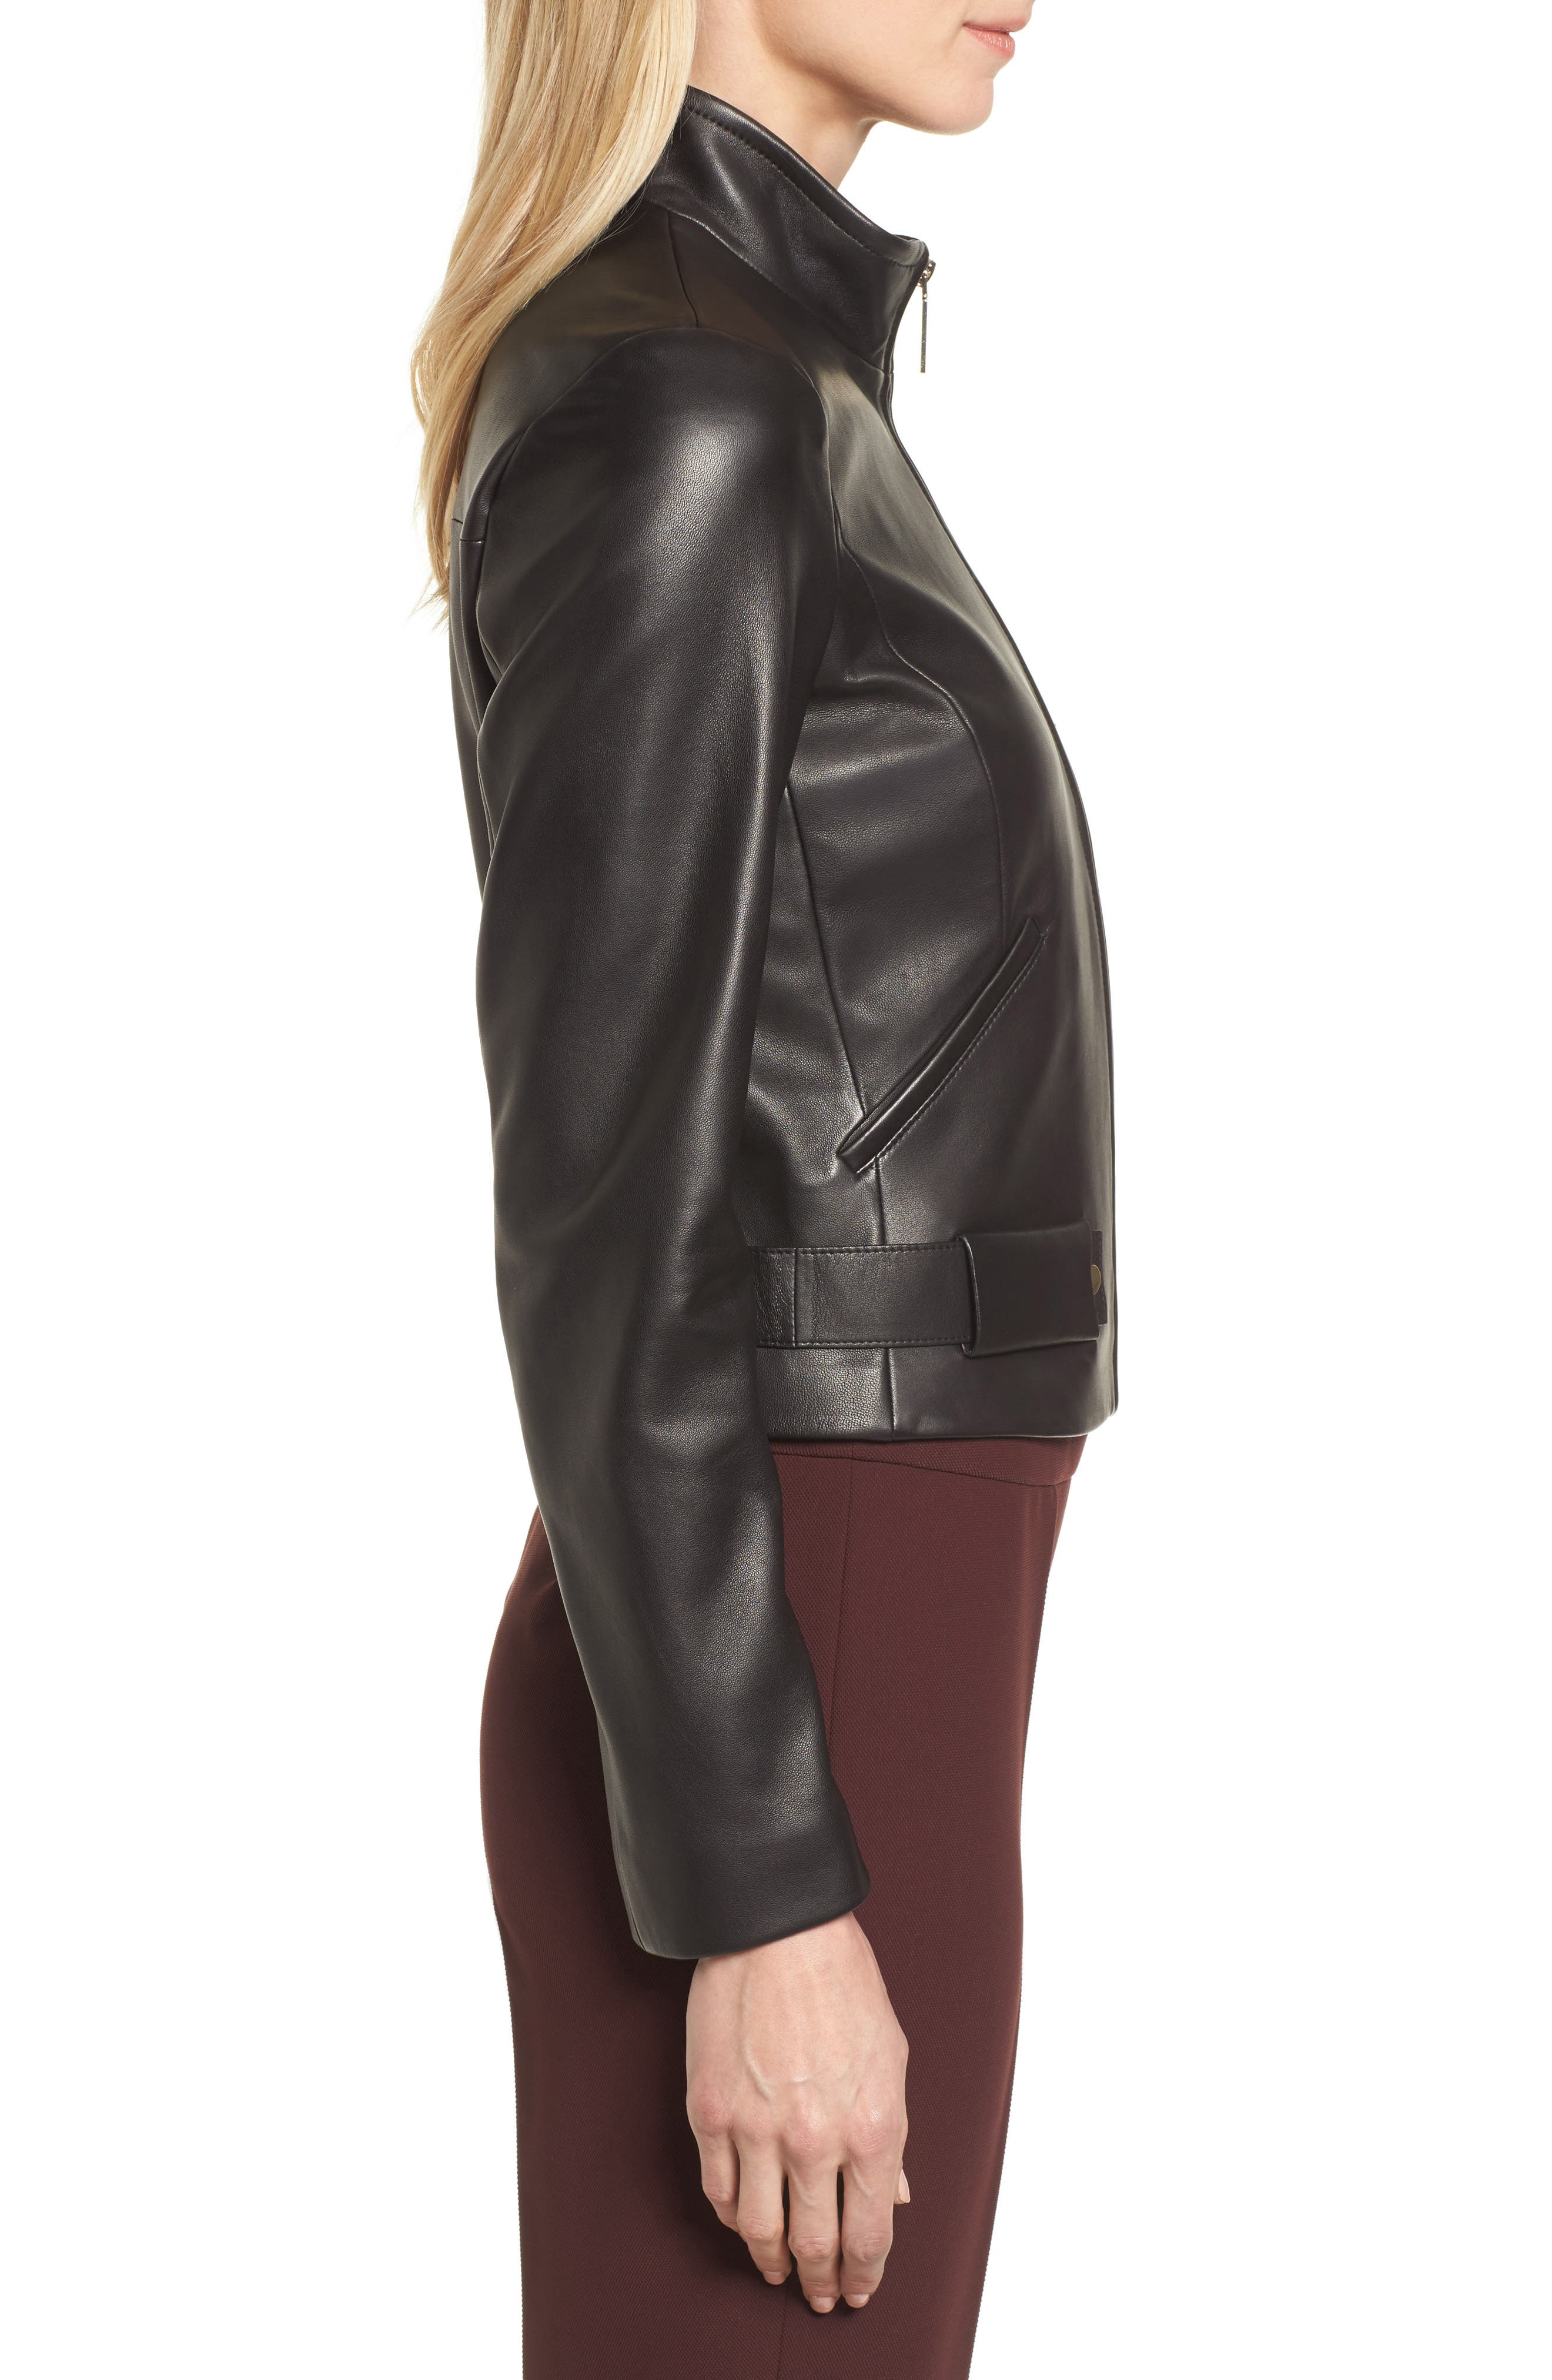 Sanuvo Leather Jacket,                             Alternate thumbnail 3, color,                             Black